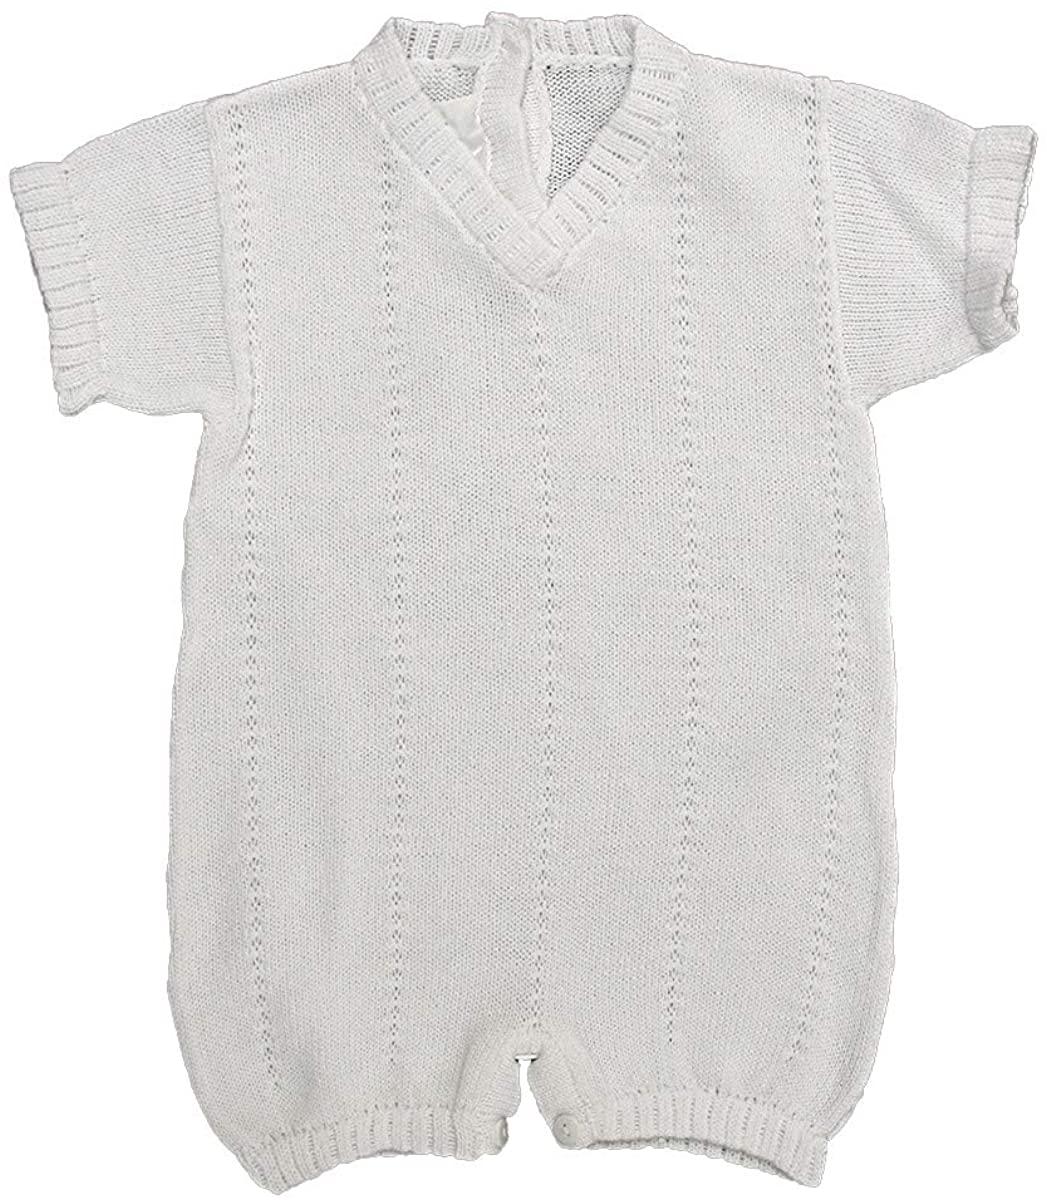 Baby's Trousseau V-Neck Short Sleeve Romper A952